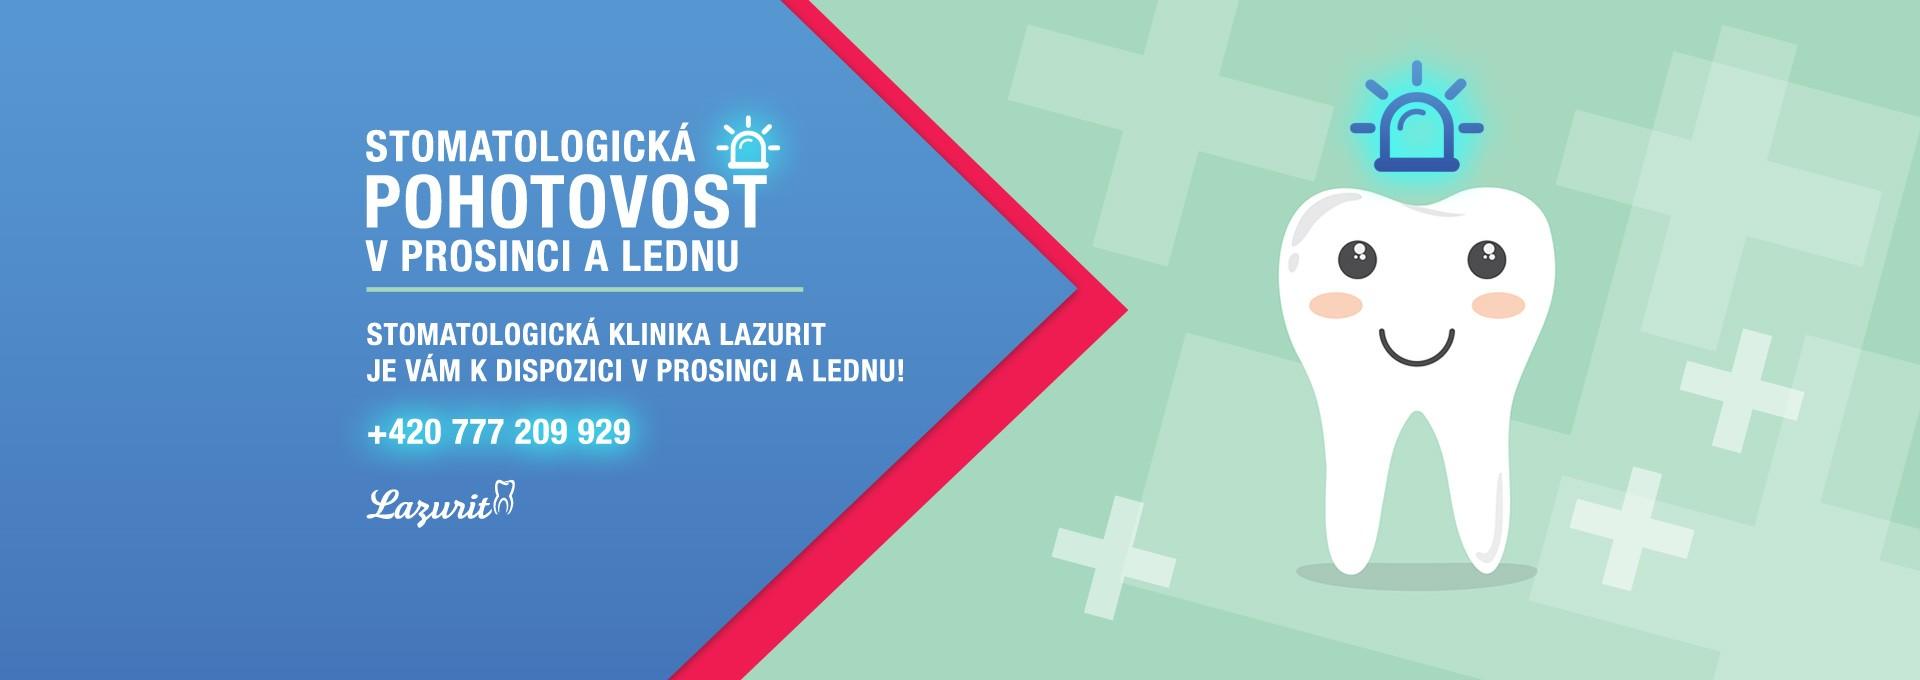 Klinika_lazurit_pohotovost_web